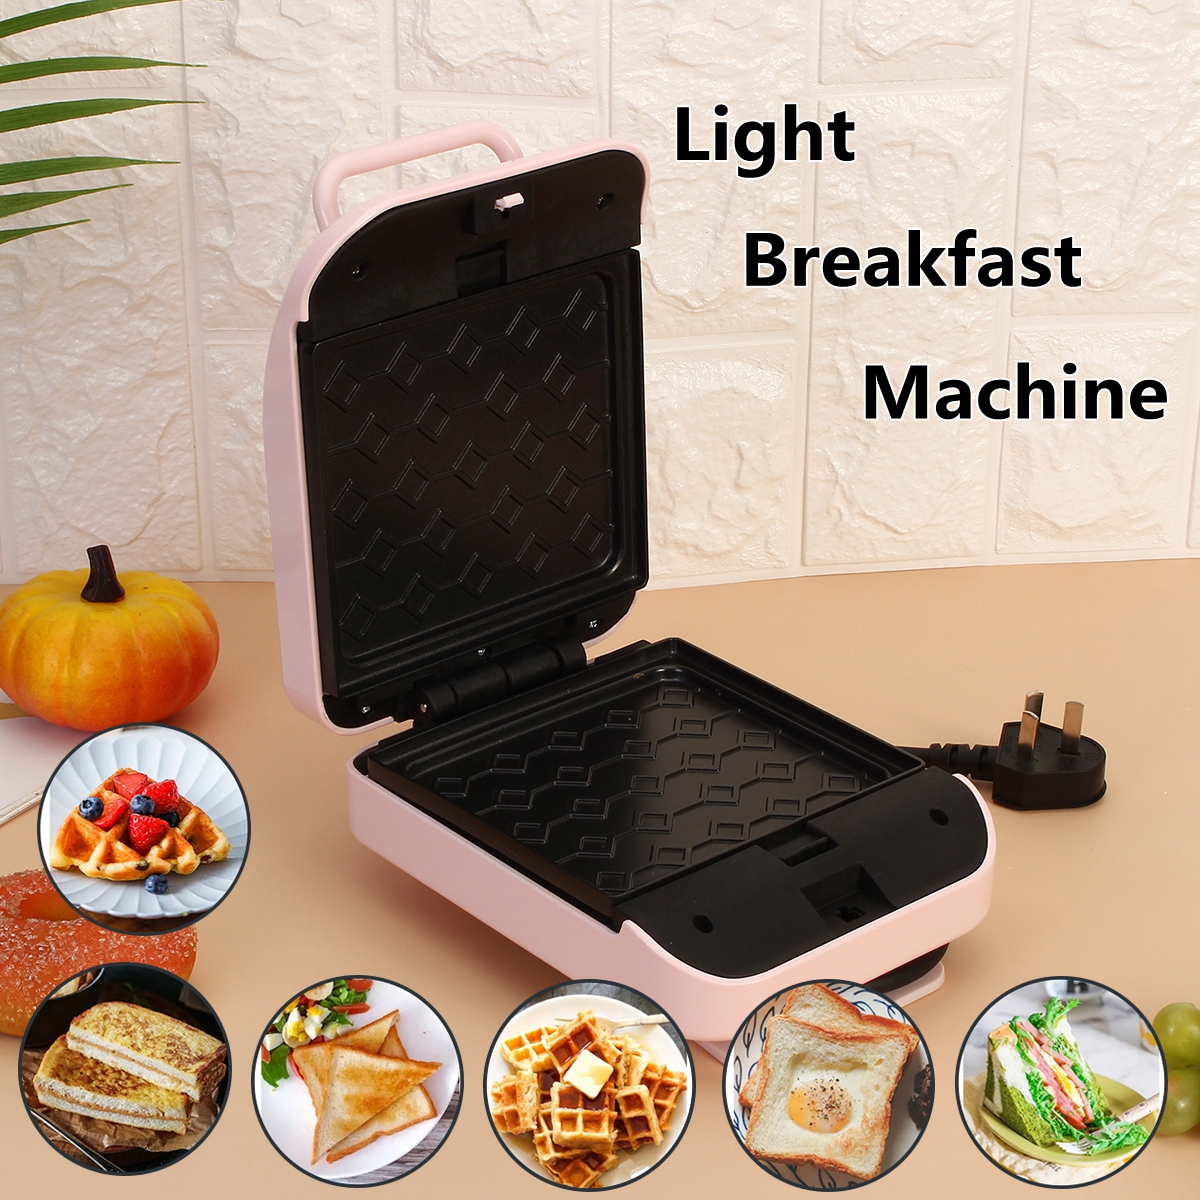 220V 600W Mini Electric Automatic Waffle Maker Sandwich Hamburger Cake Bubble Egg Oven Pan Pot Machine for Breakfast Dinner